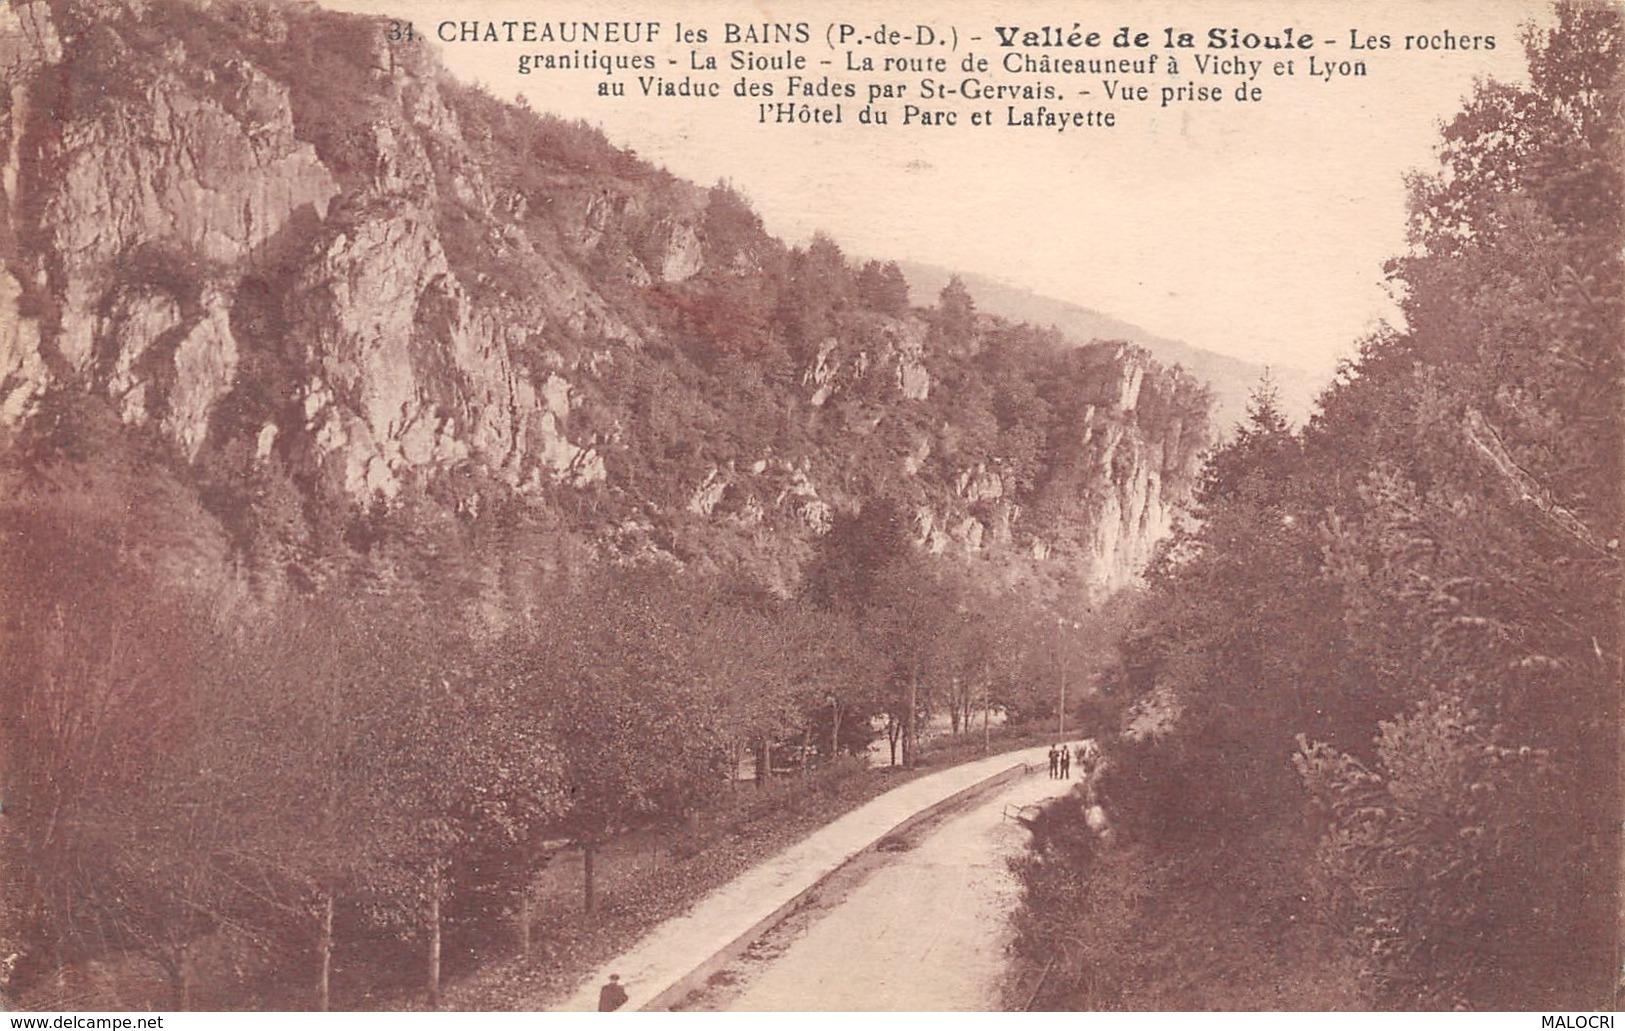 63-CHATEAUNEUF LES BAINS-N°1200-B/0323 - France